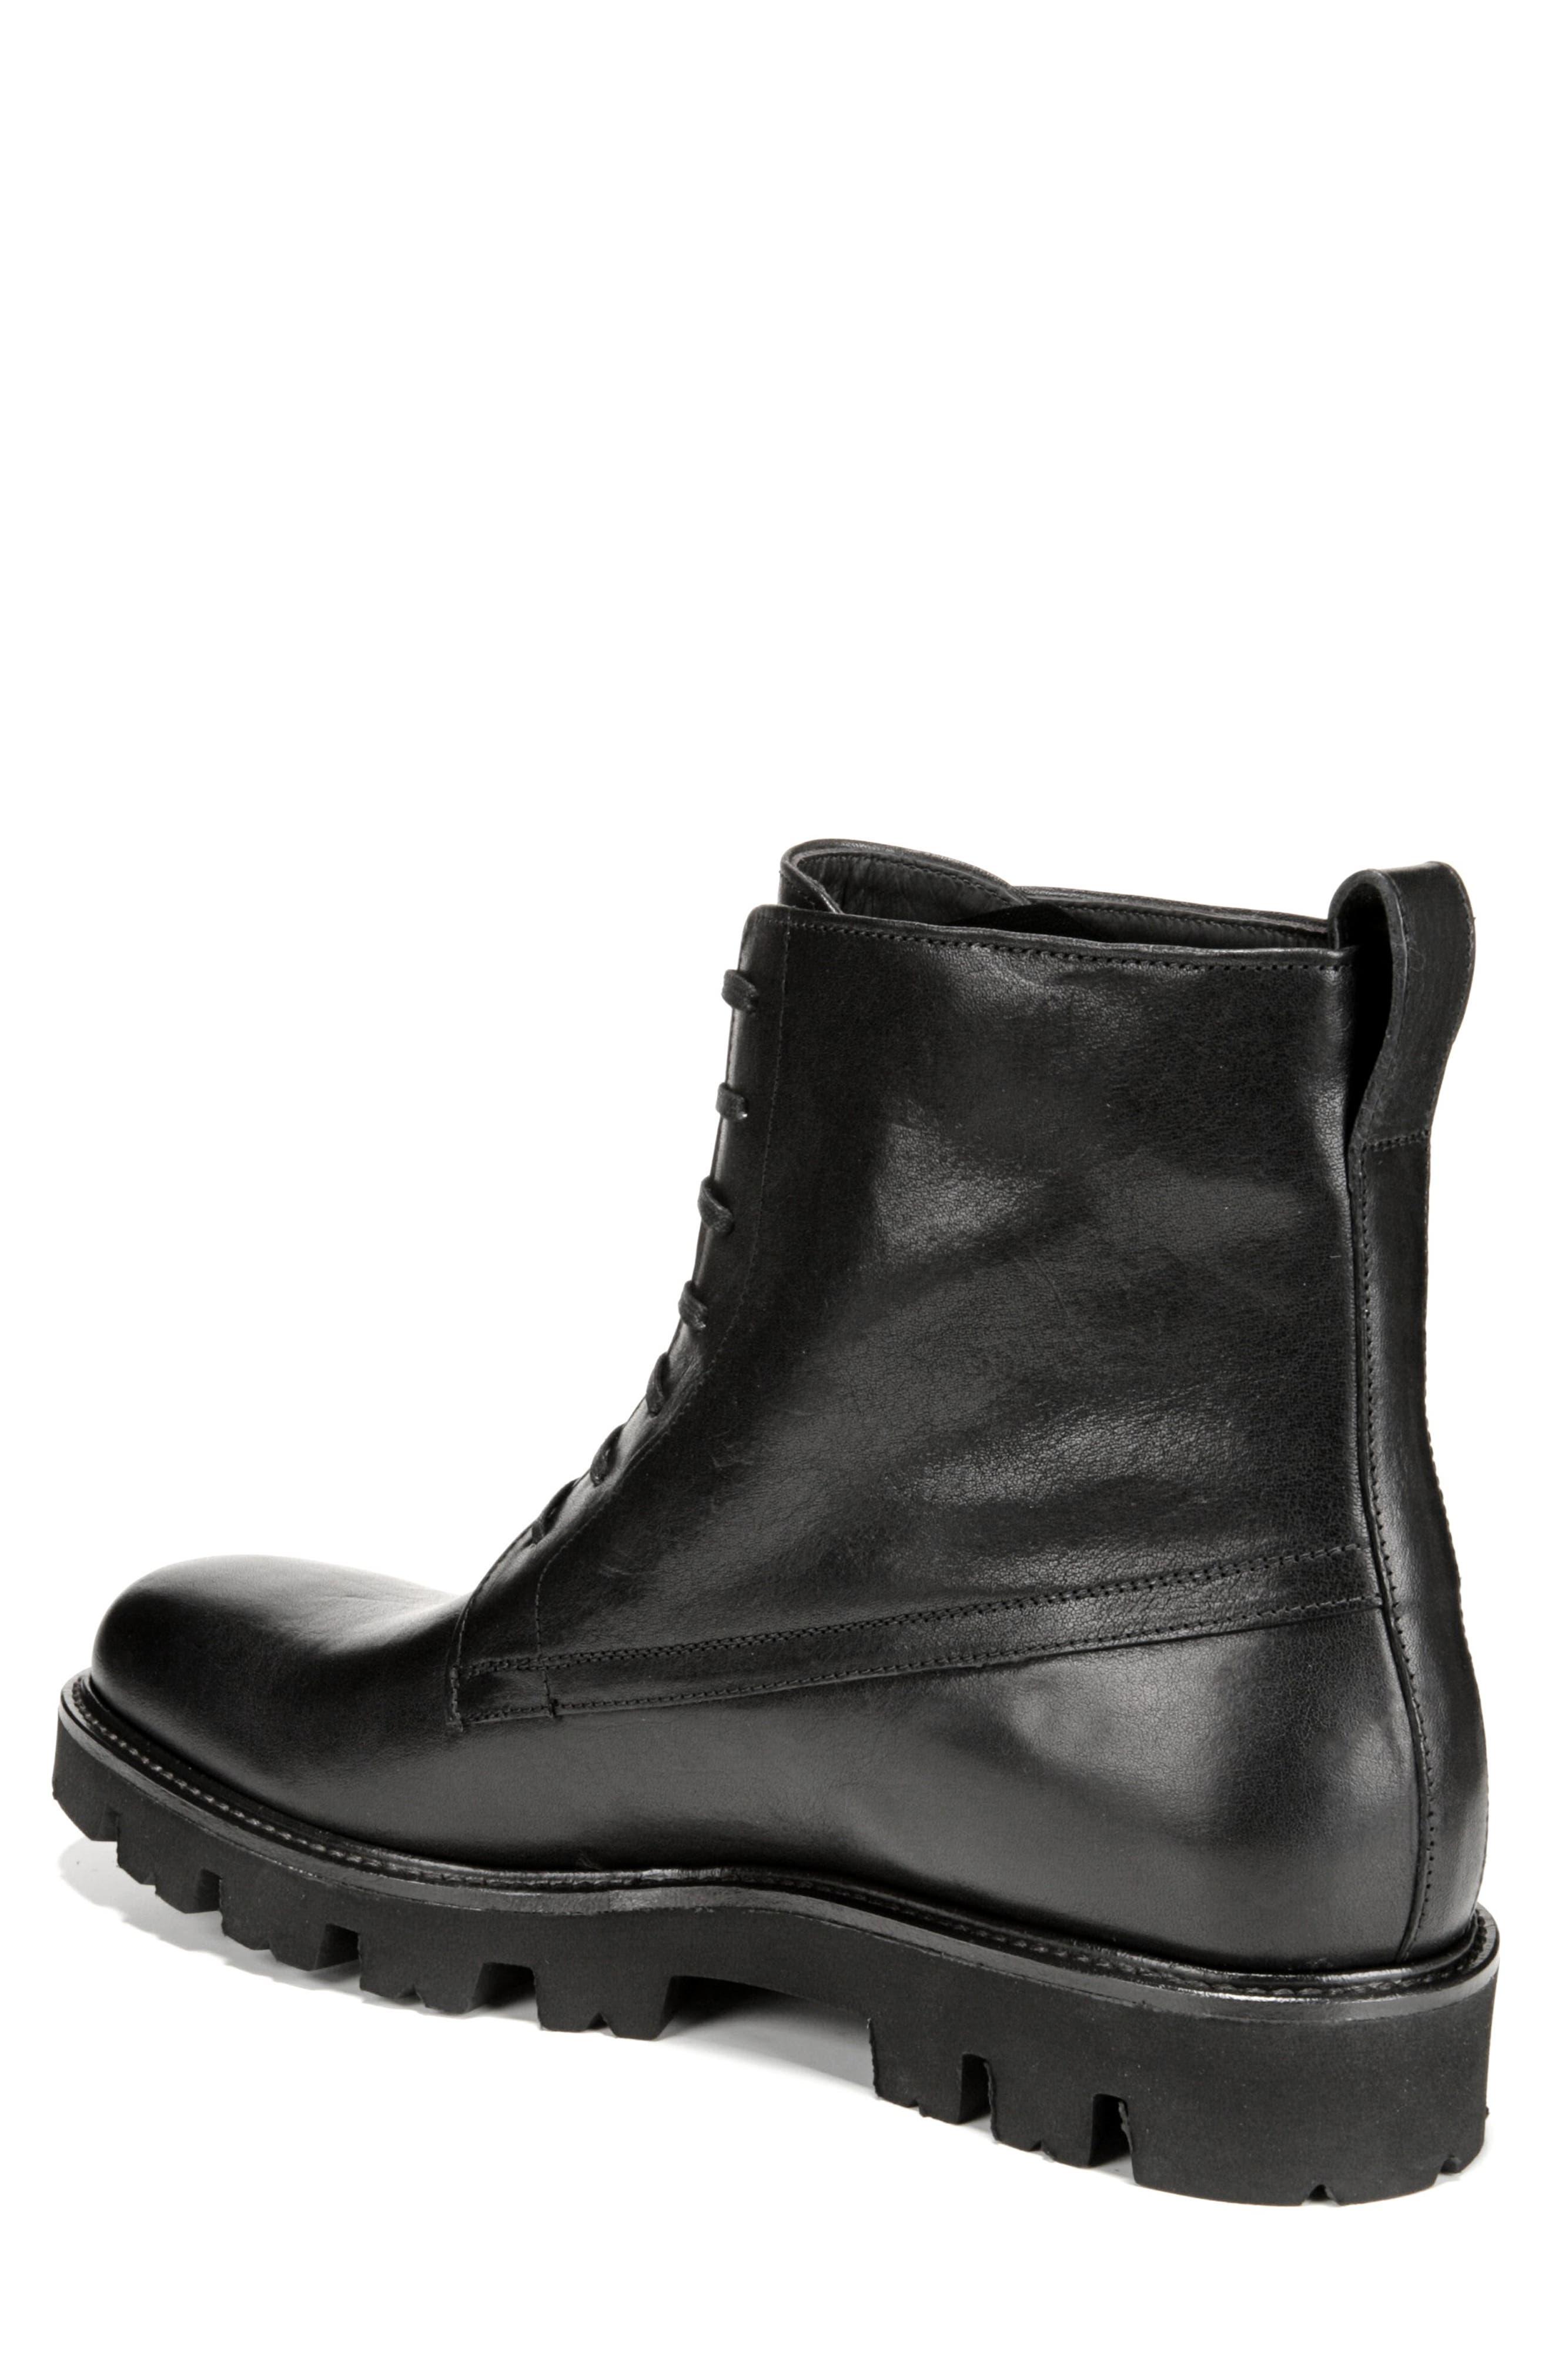 Commander Plain Toe Boot,                             Alternate thumbnail 2, color,                             001